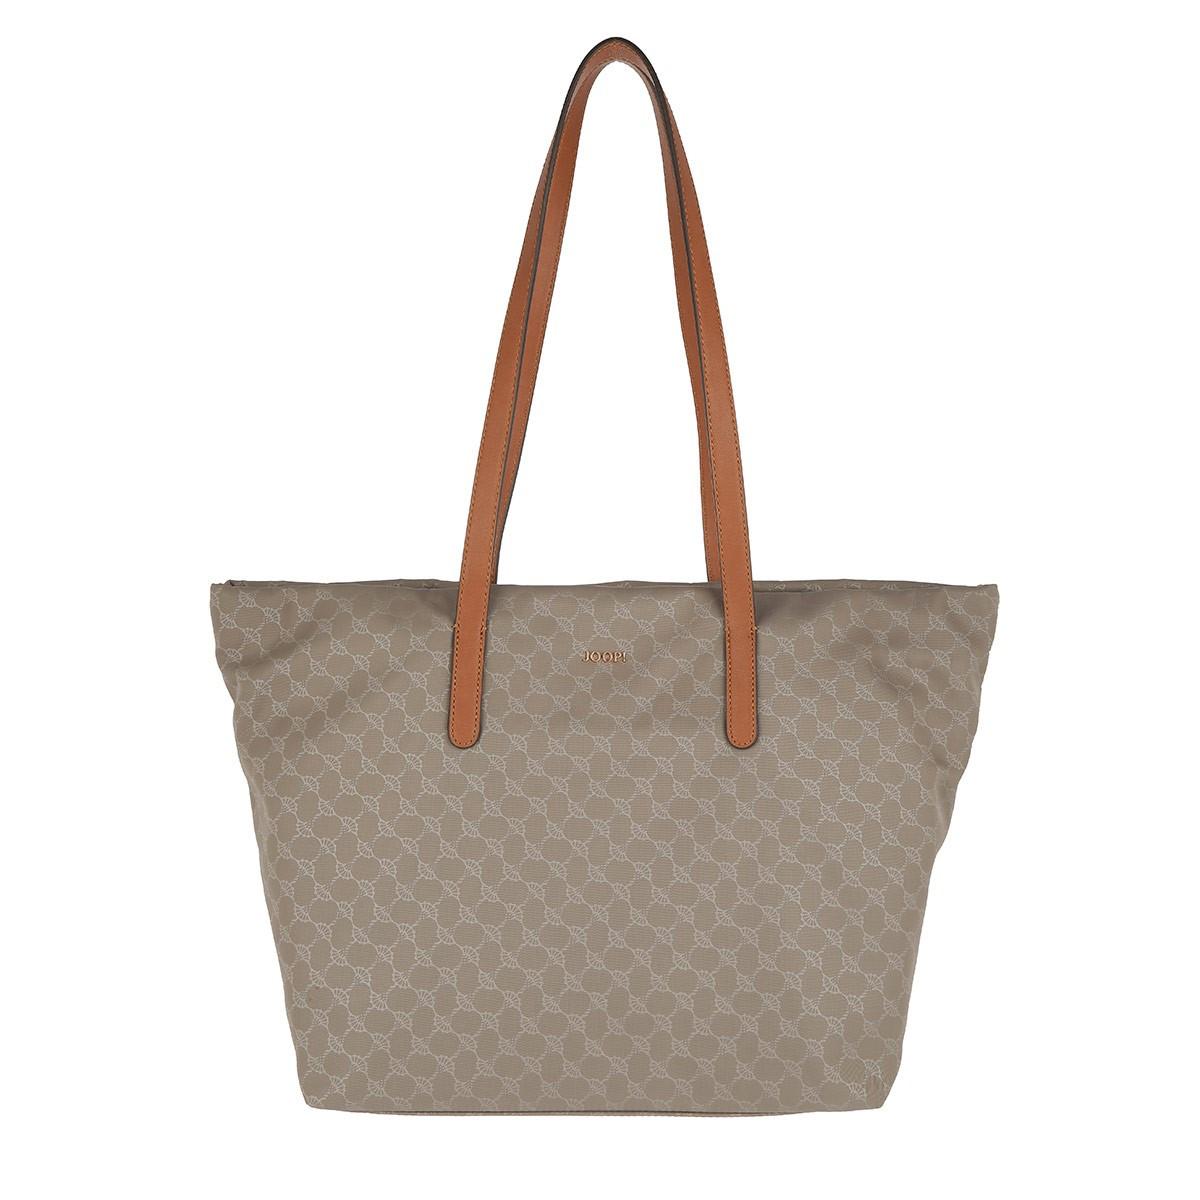 JOOP! Shopper - Nylon Cornflower Helena Shopper Beige - in grau - für Damen